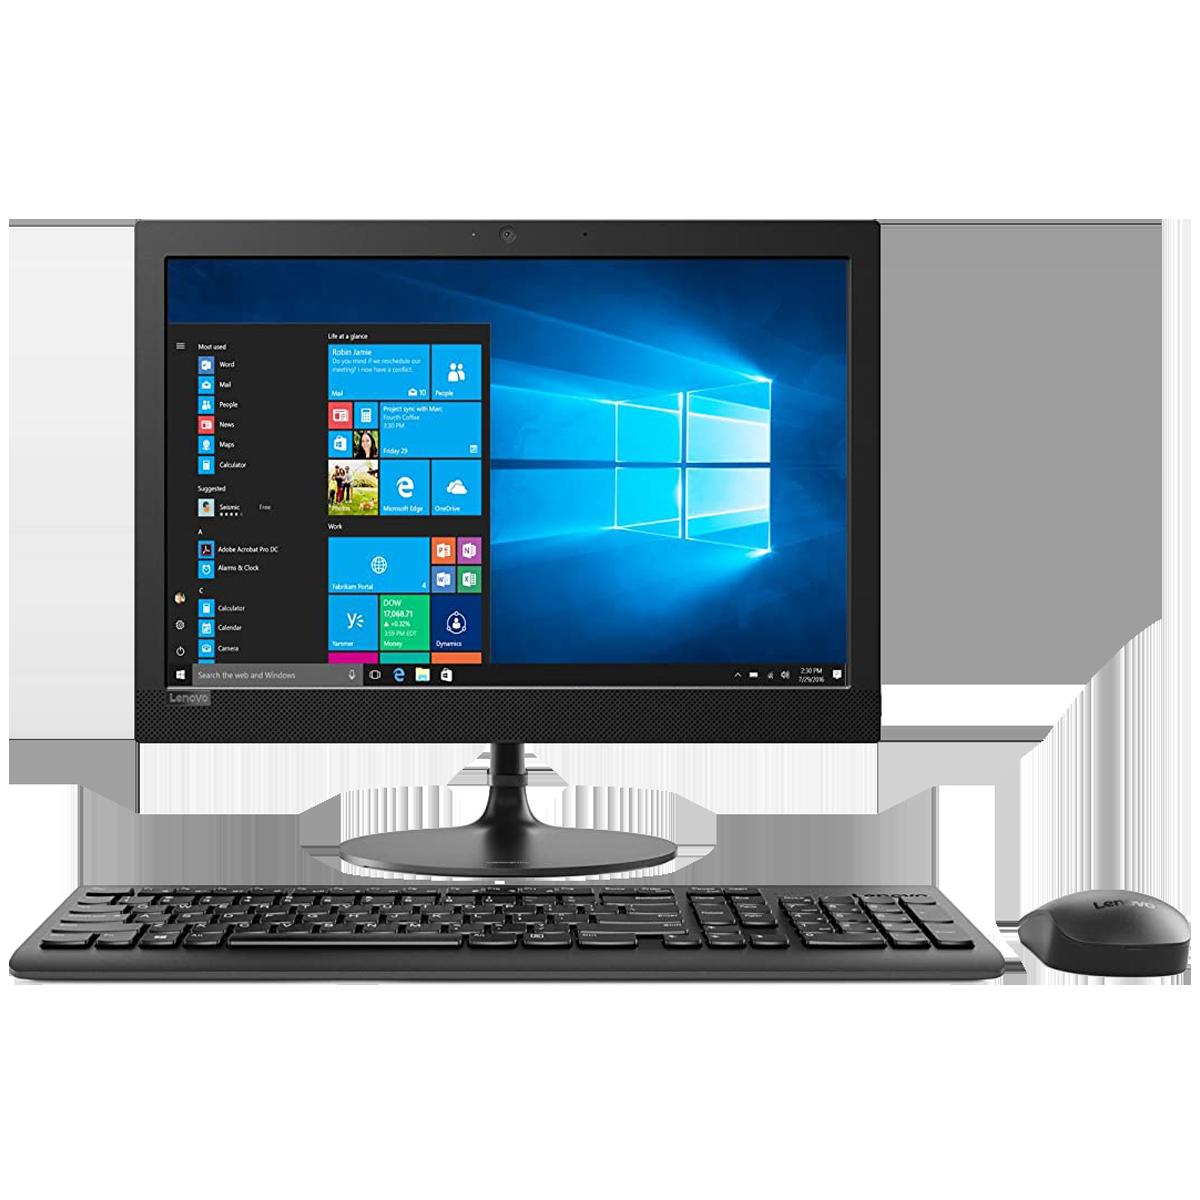 Lenovo IdeaCentre AIO 330-20IGM (F0D7008KIN) Pentium Silver Windows 10 Home All-in-One Desktop (4GB RAM, 1TB HDD, Intel UHD 605 Graphics, MS Office, 49.53cm. Black)_1